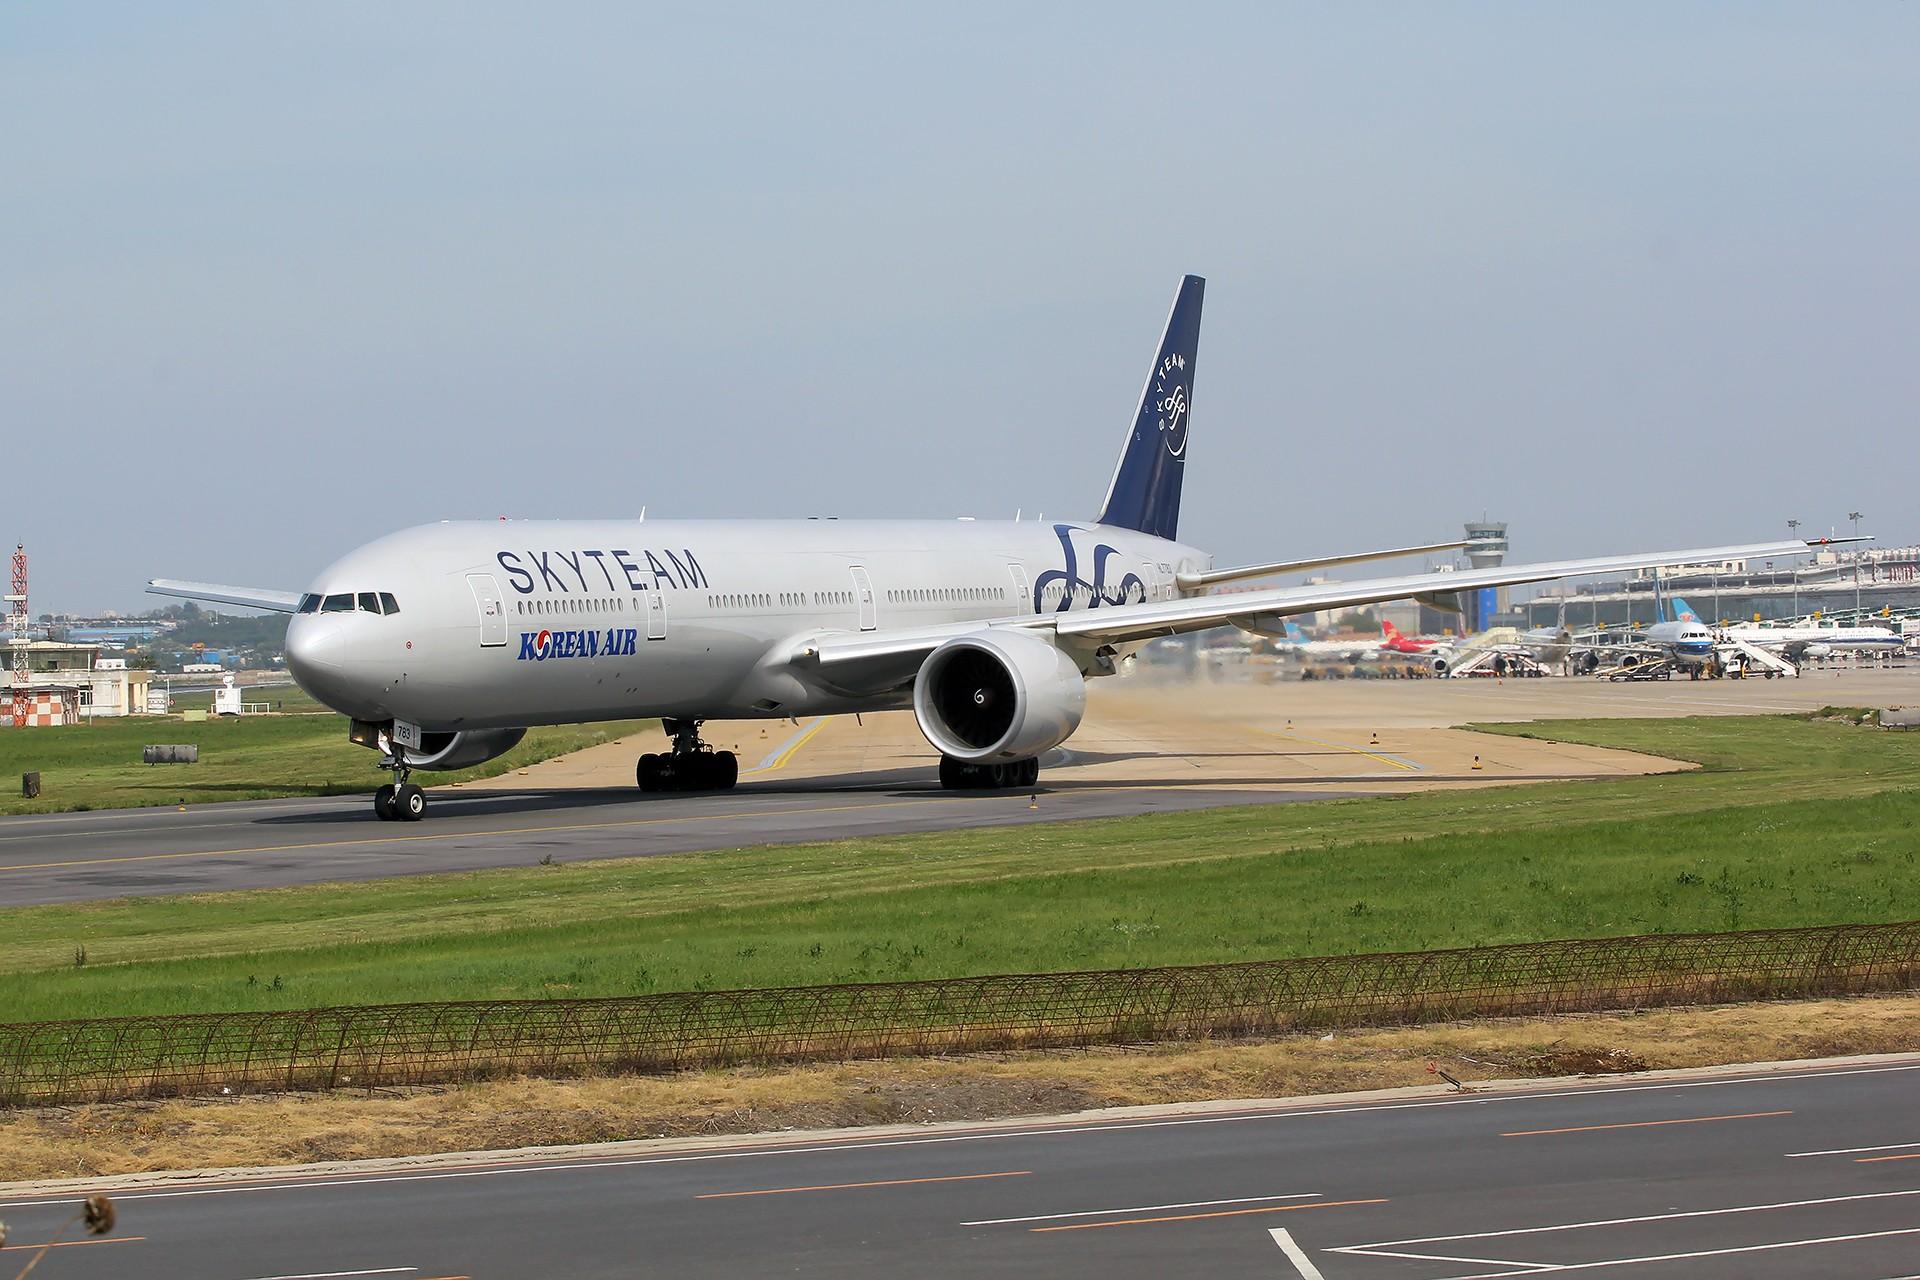 Re:[原创][DLC]。。。大韩航空天合联盟777-300ER HL7783。。。 BOEING 777-300ER HL7783 中国大连国际机场